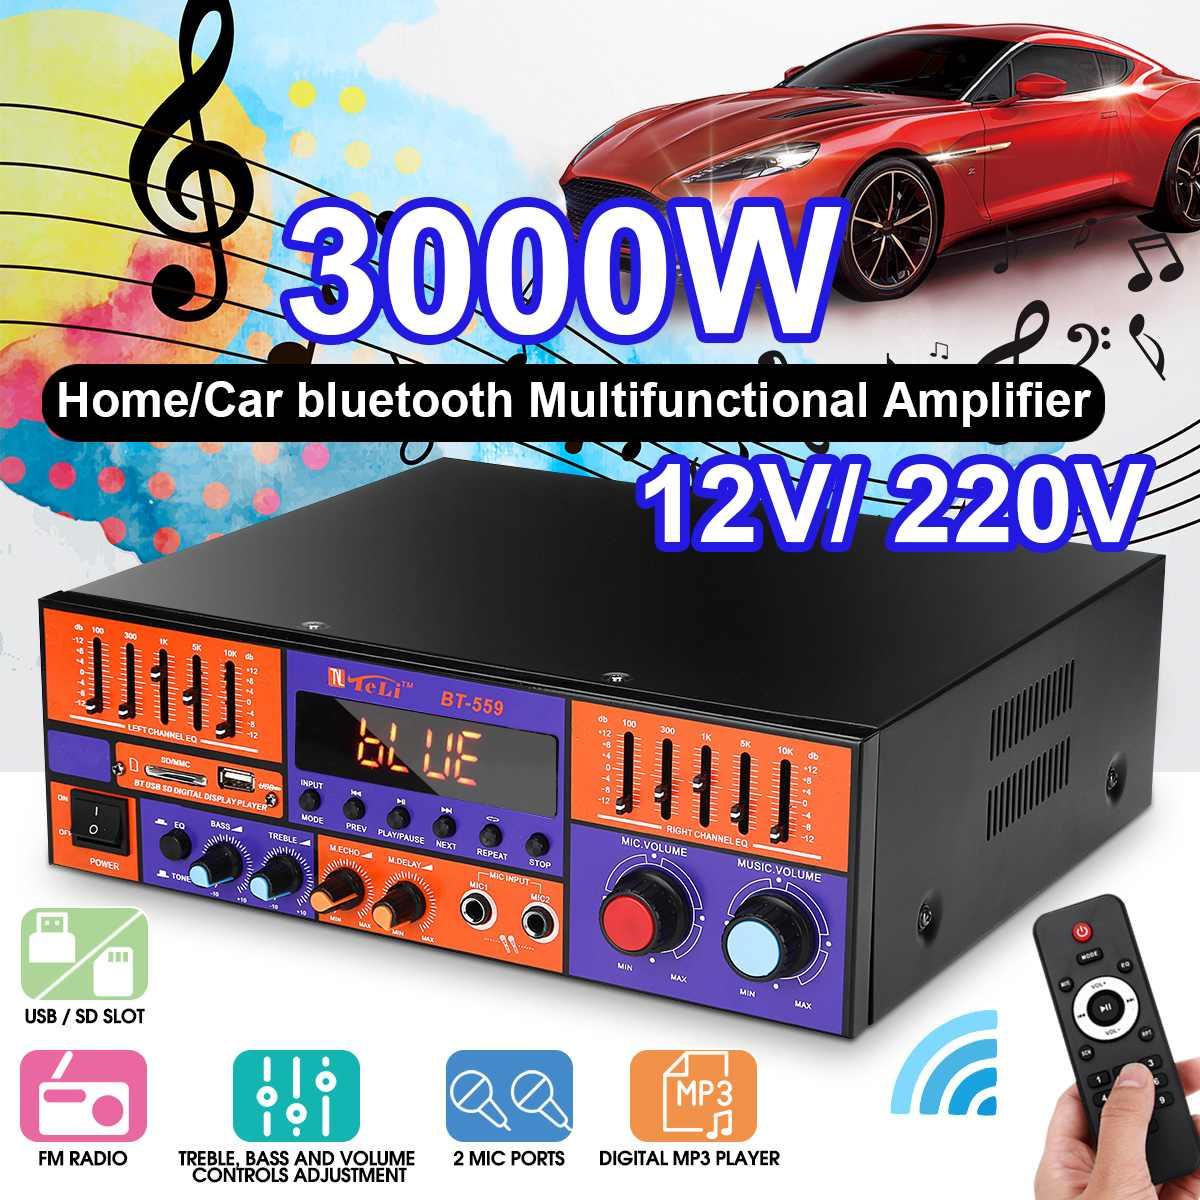 Bluetooth Audio Power Verstärker 3000W Auto Home Digitale HIFI Stereo Verstärker 2 Kanäle Verstärker USB FM SD mit Fernbedienung control